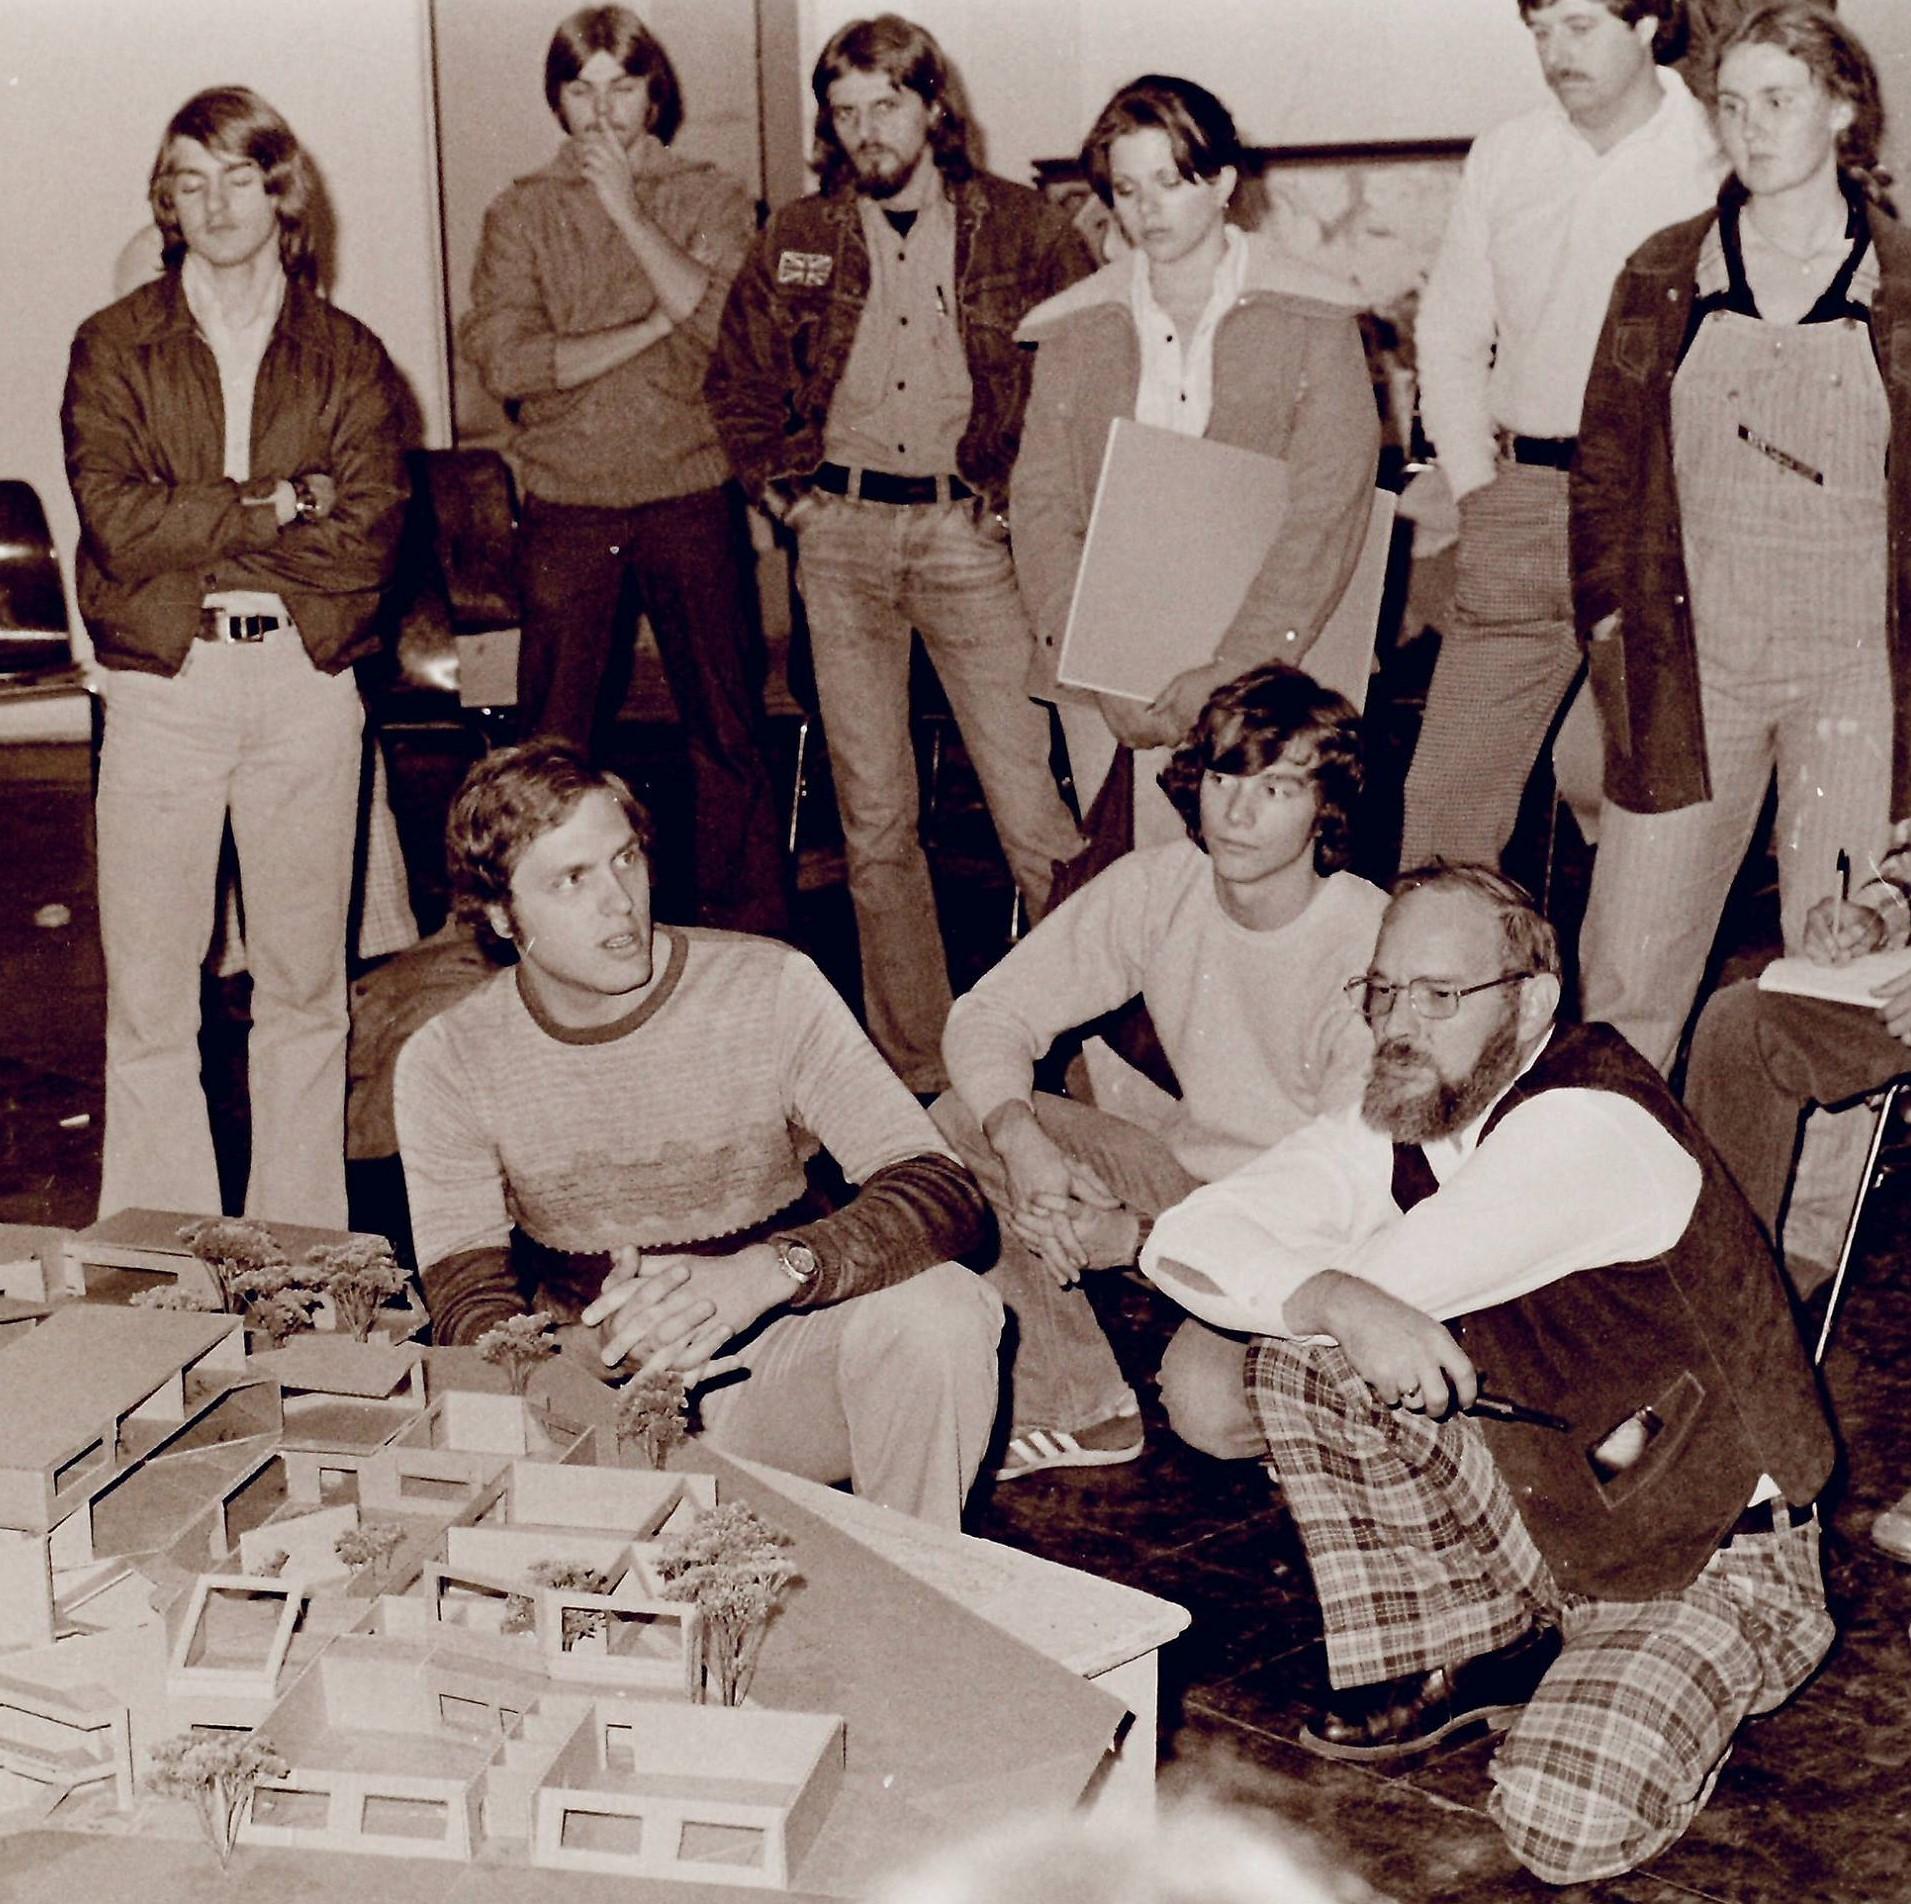 Faculty Leslie Motz with students. Courtesy of Purdue University, Fort Wayne